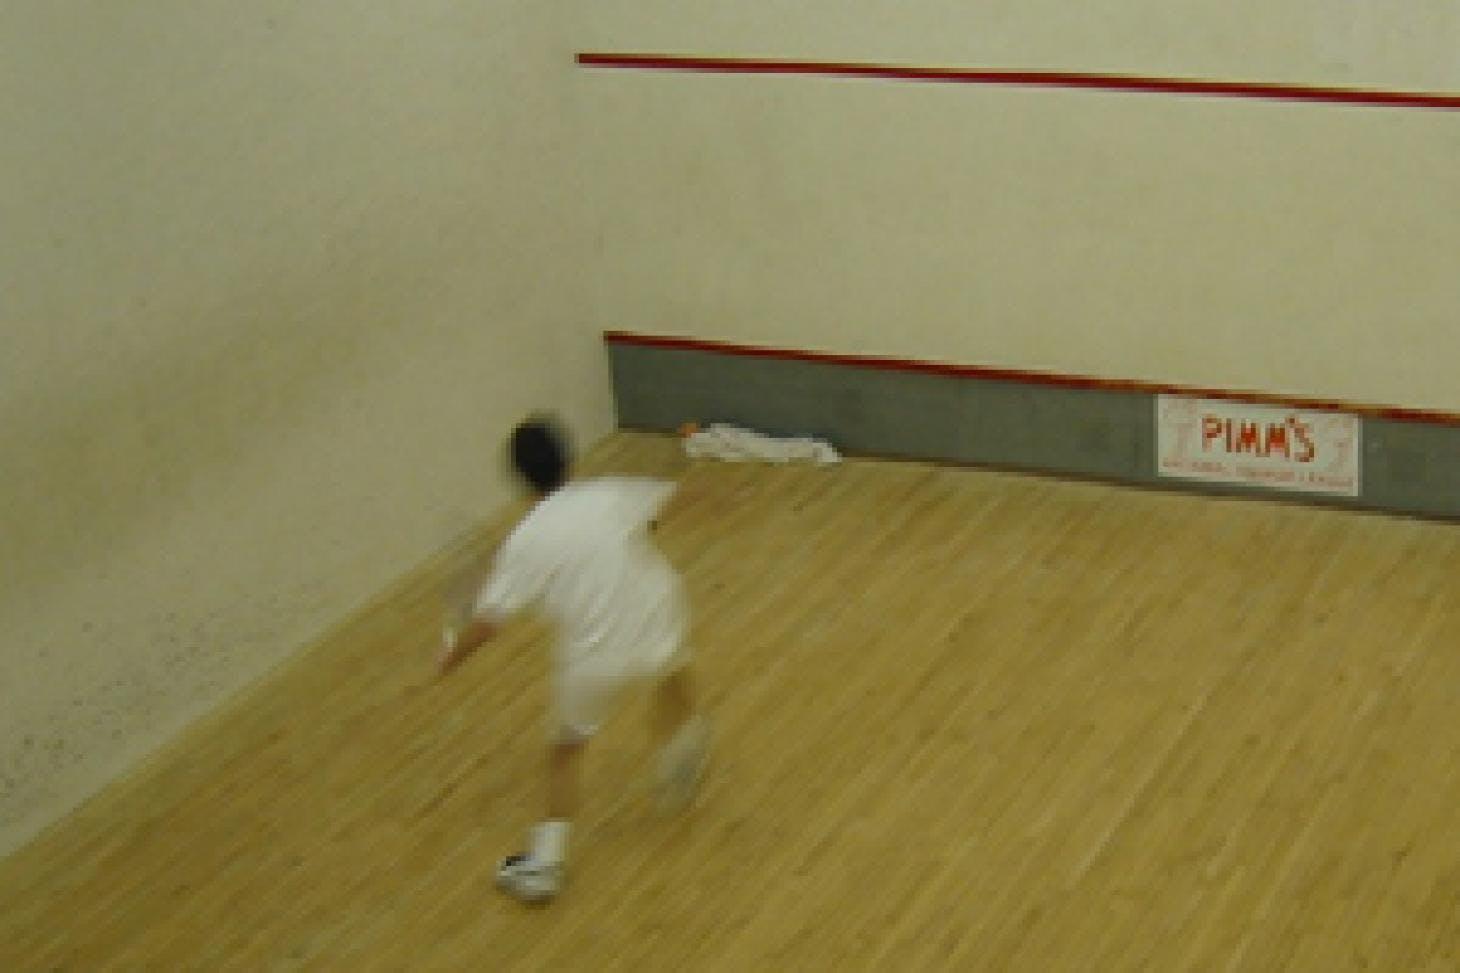 The Temple Fortune Club Indoor | Hard squash court